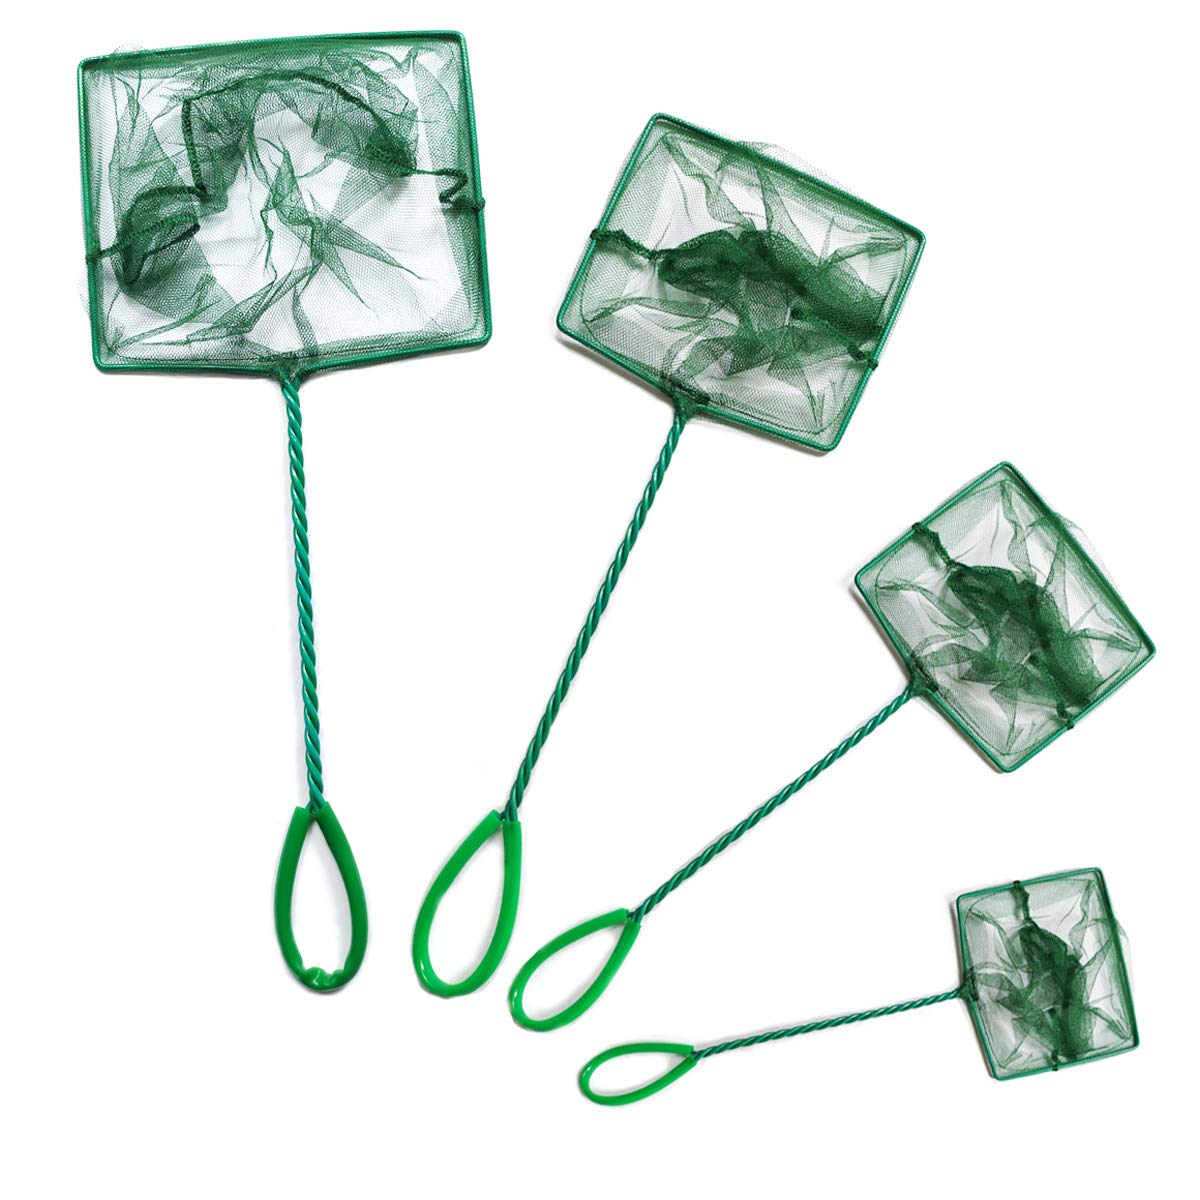 NGe 4Pcs Aquarium Fish Net Small Nylon Fishing Nets with Plastic Handle for Fish Tank 8inch/6inch/5inch/4inch, Green